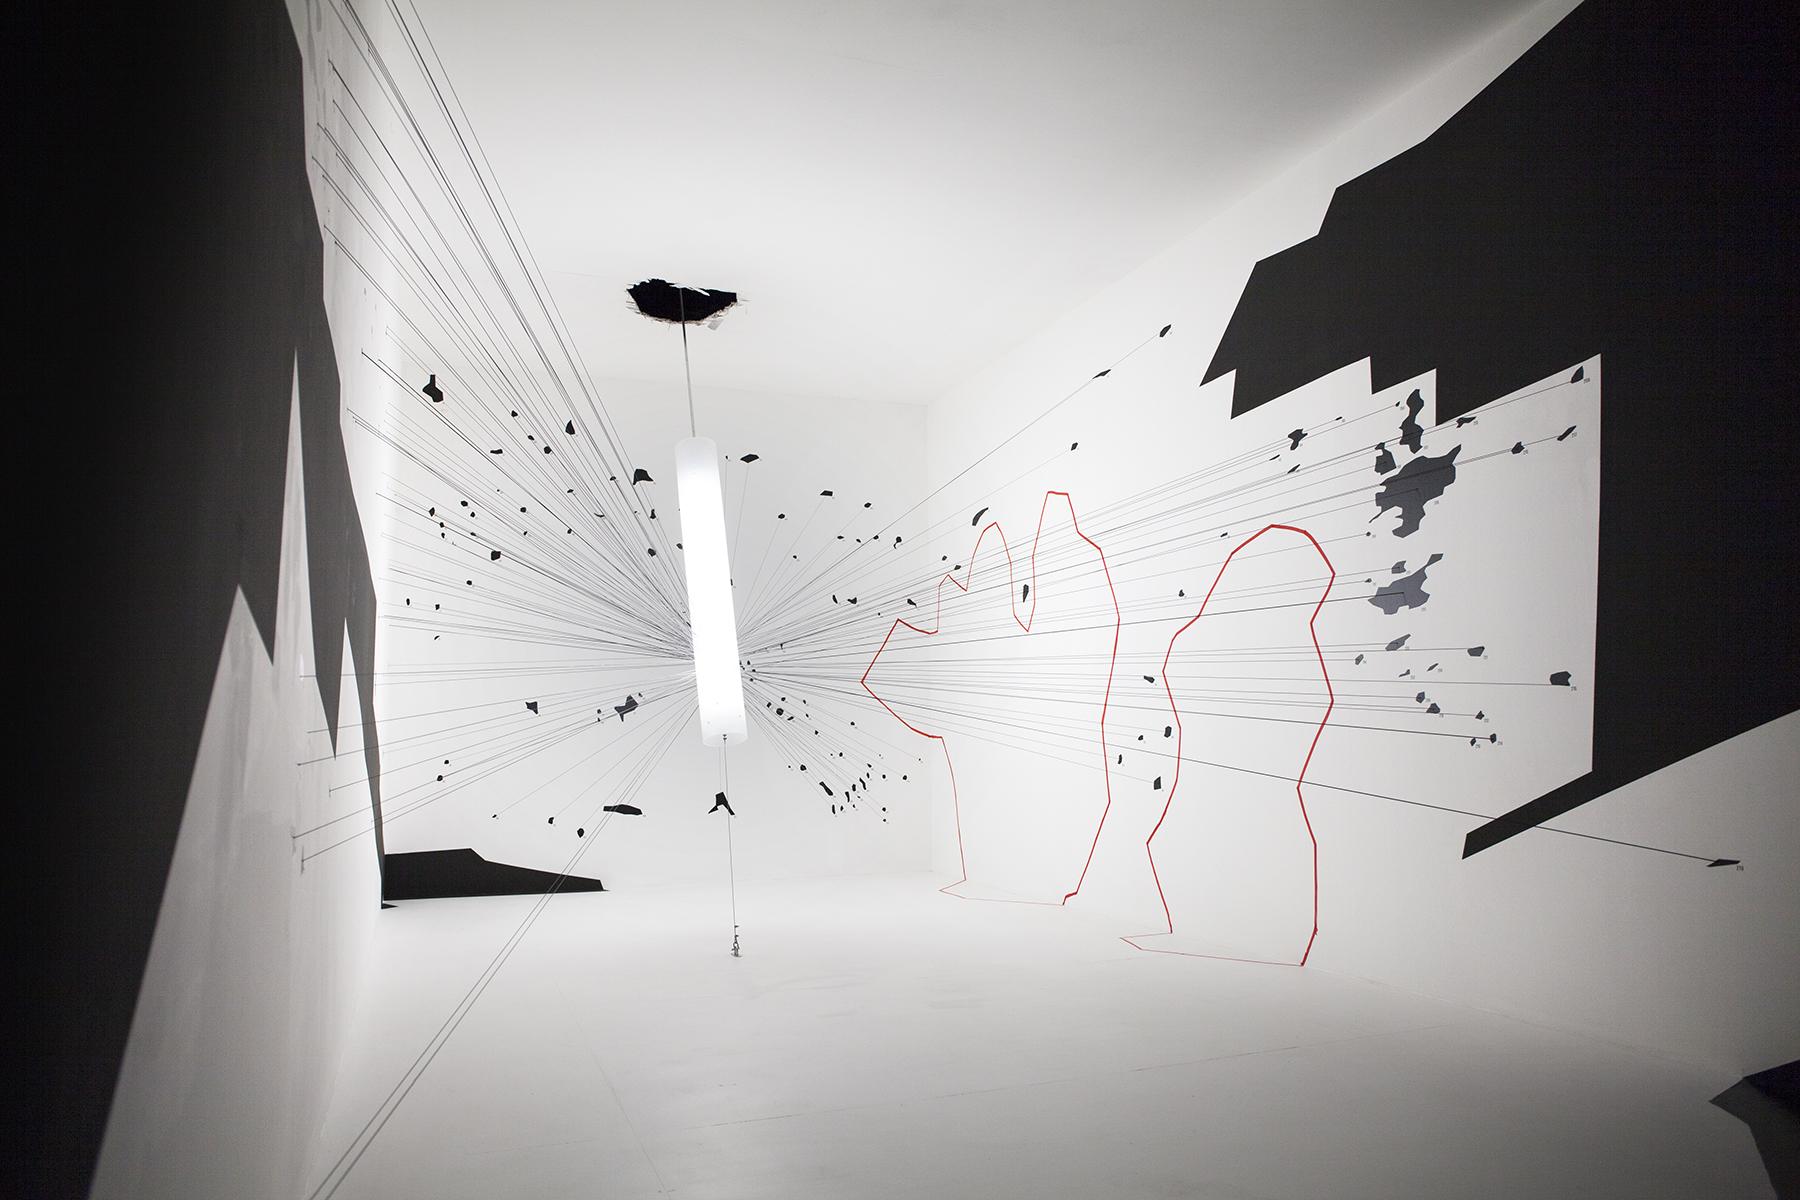 Miranshah_drone_strike,_Forensic_Architecture[1].jpg